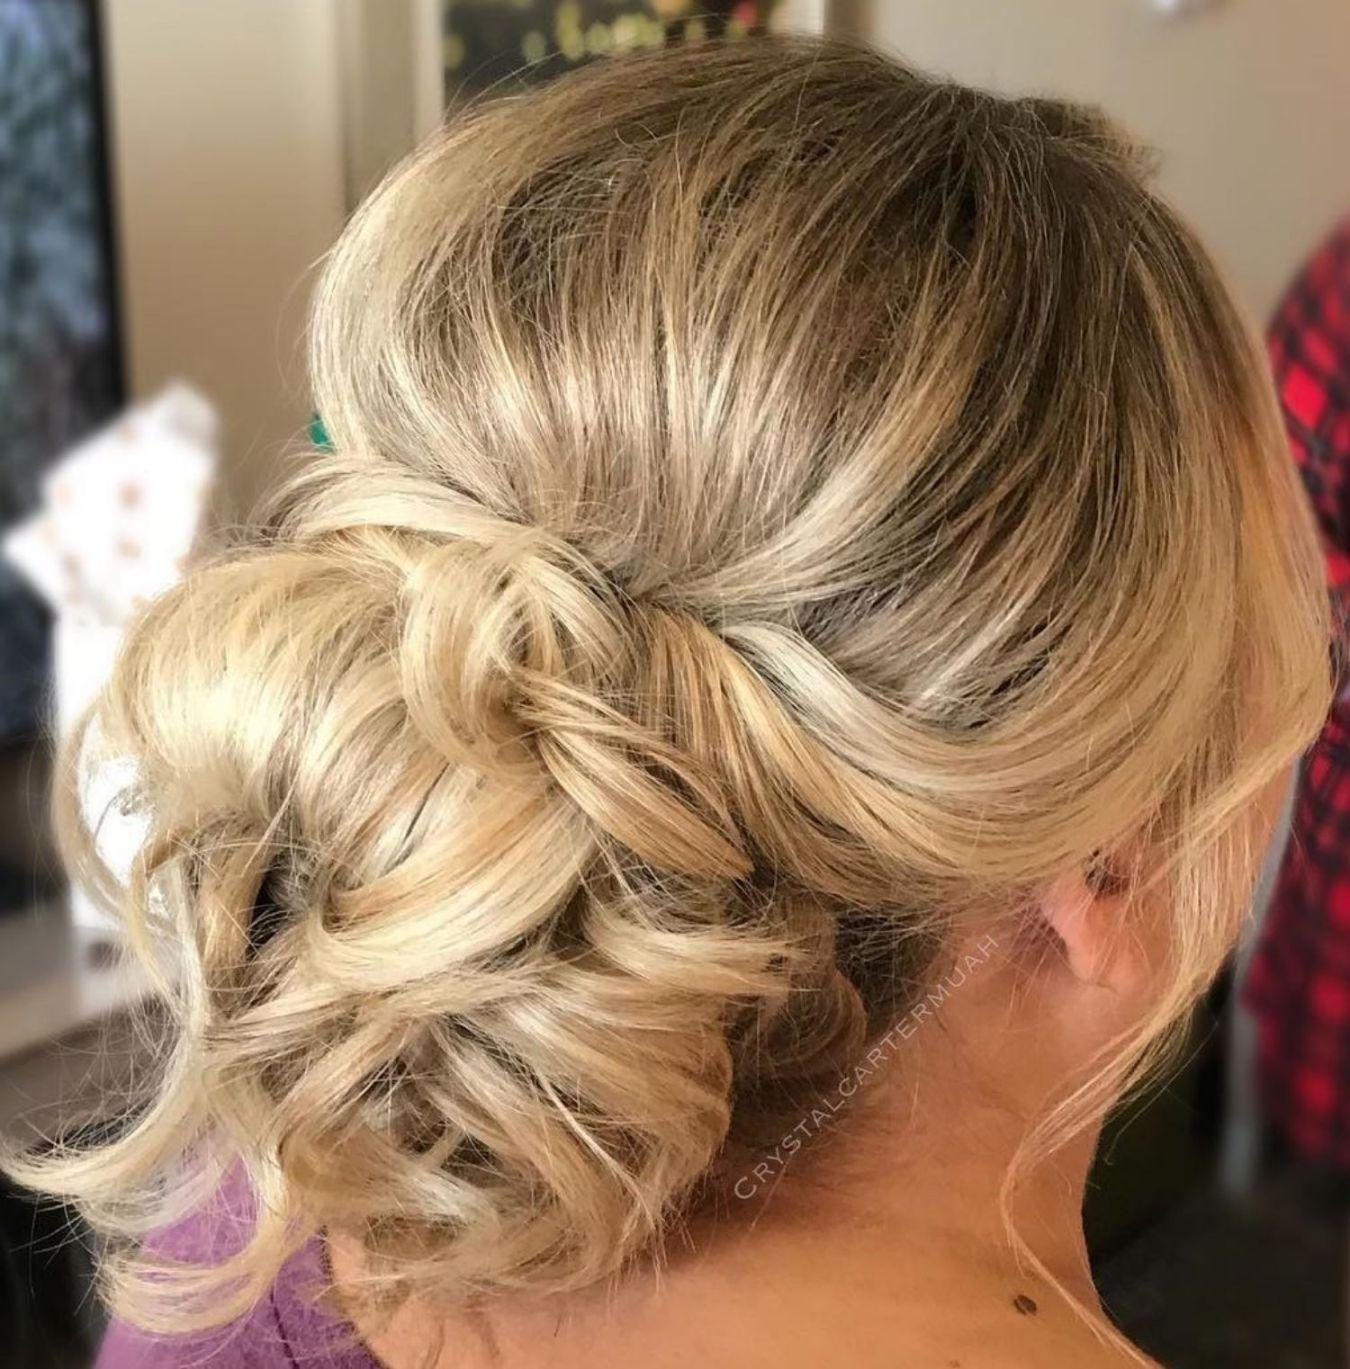 ravishing mother of the bride hairstyles in wedding hair